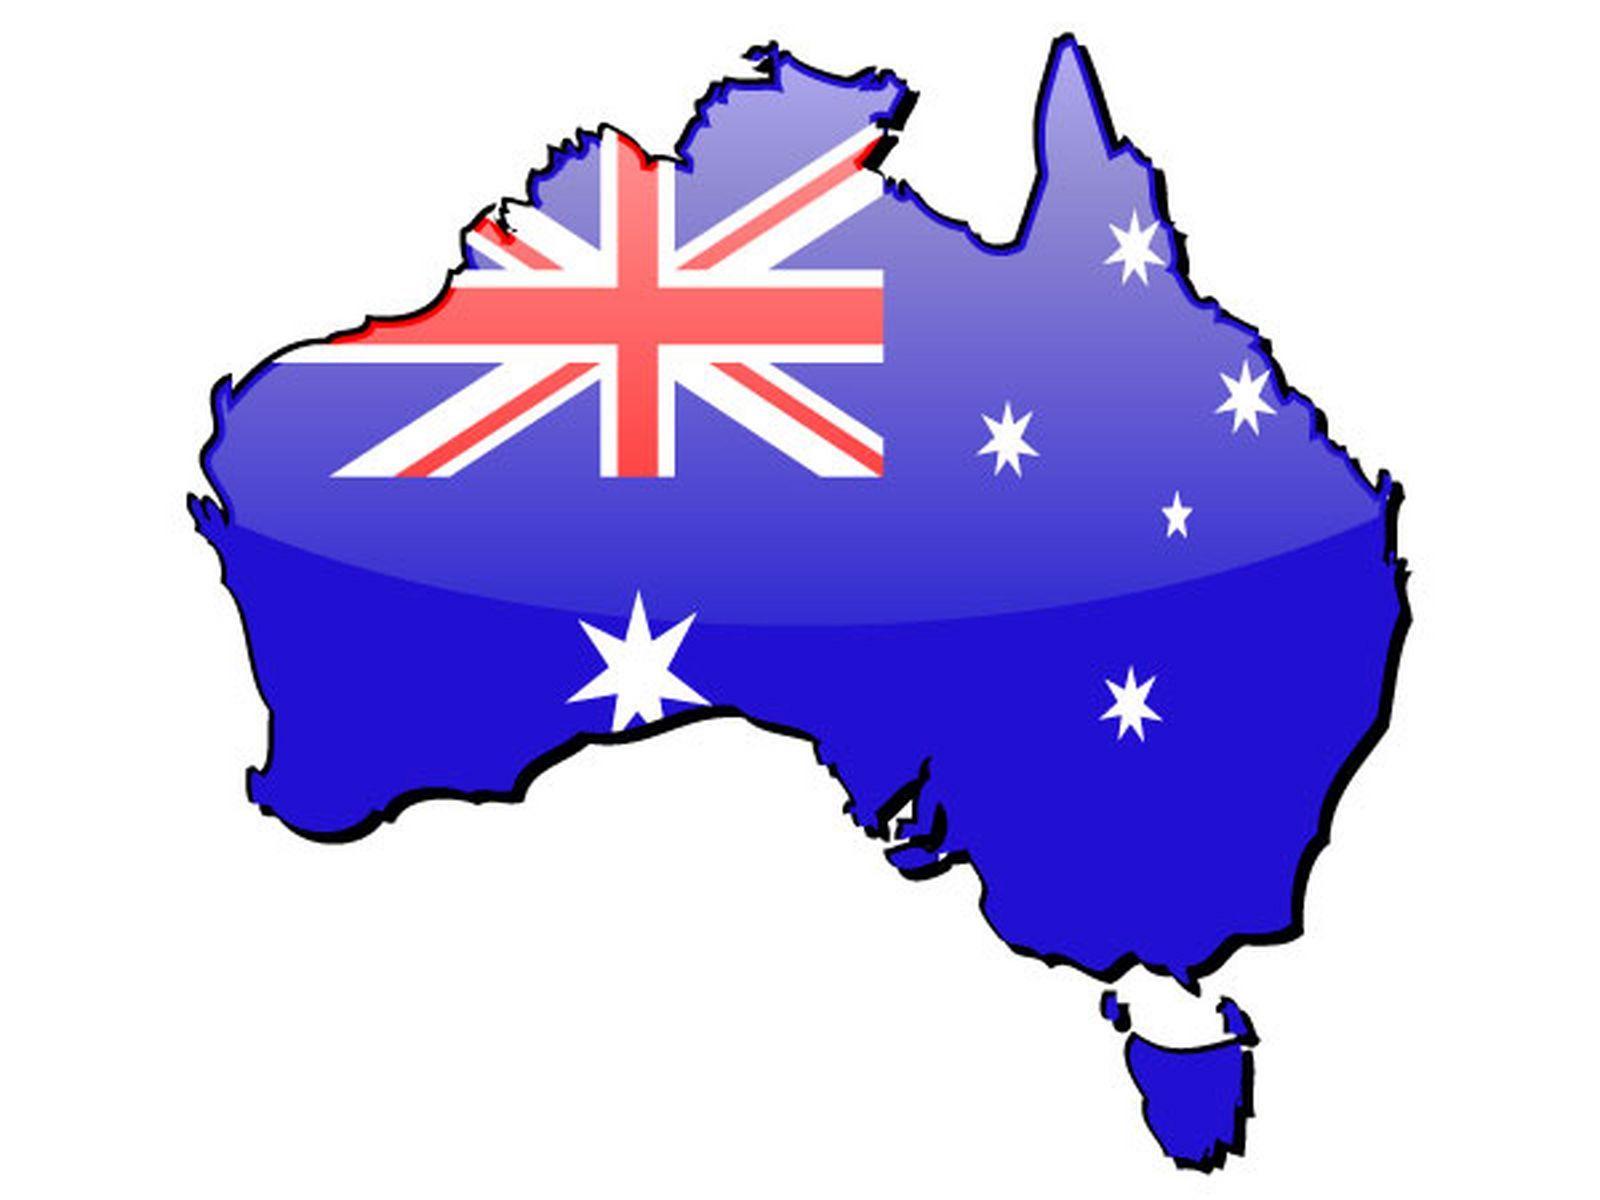 Australia flag wallpapers Latest Australia wallpapers 1600x1200